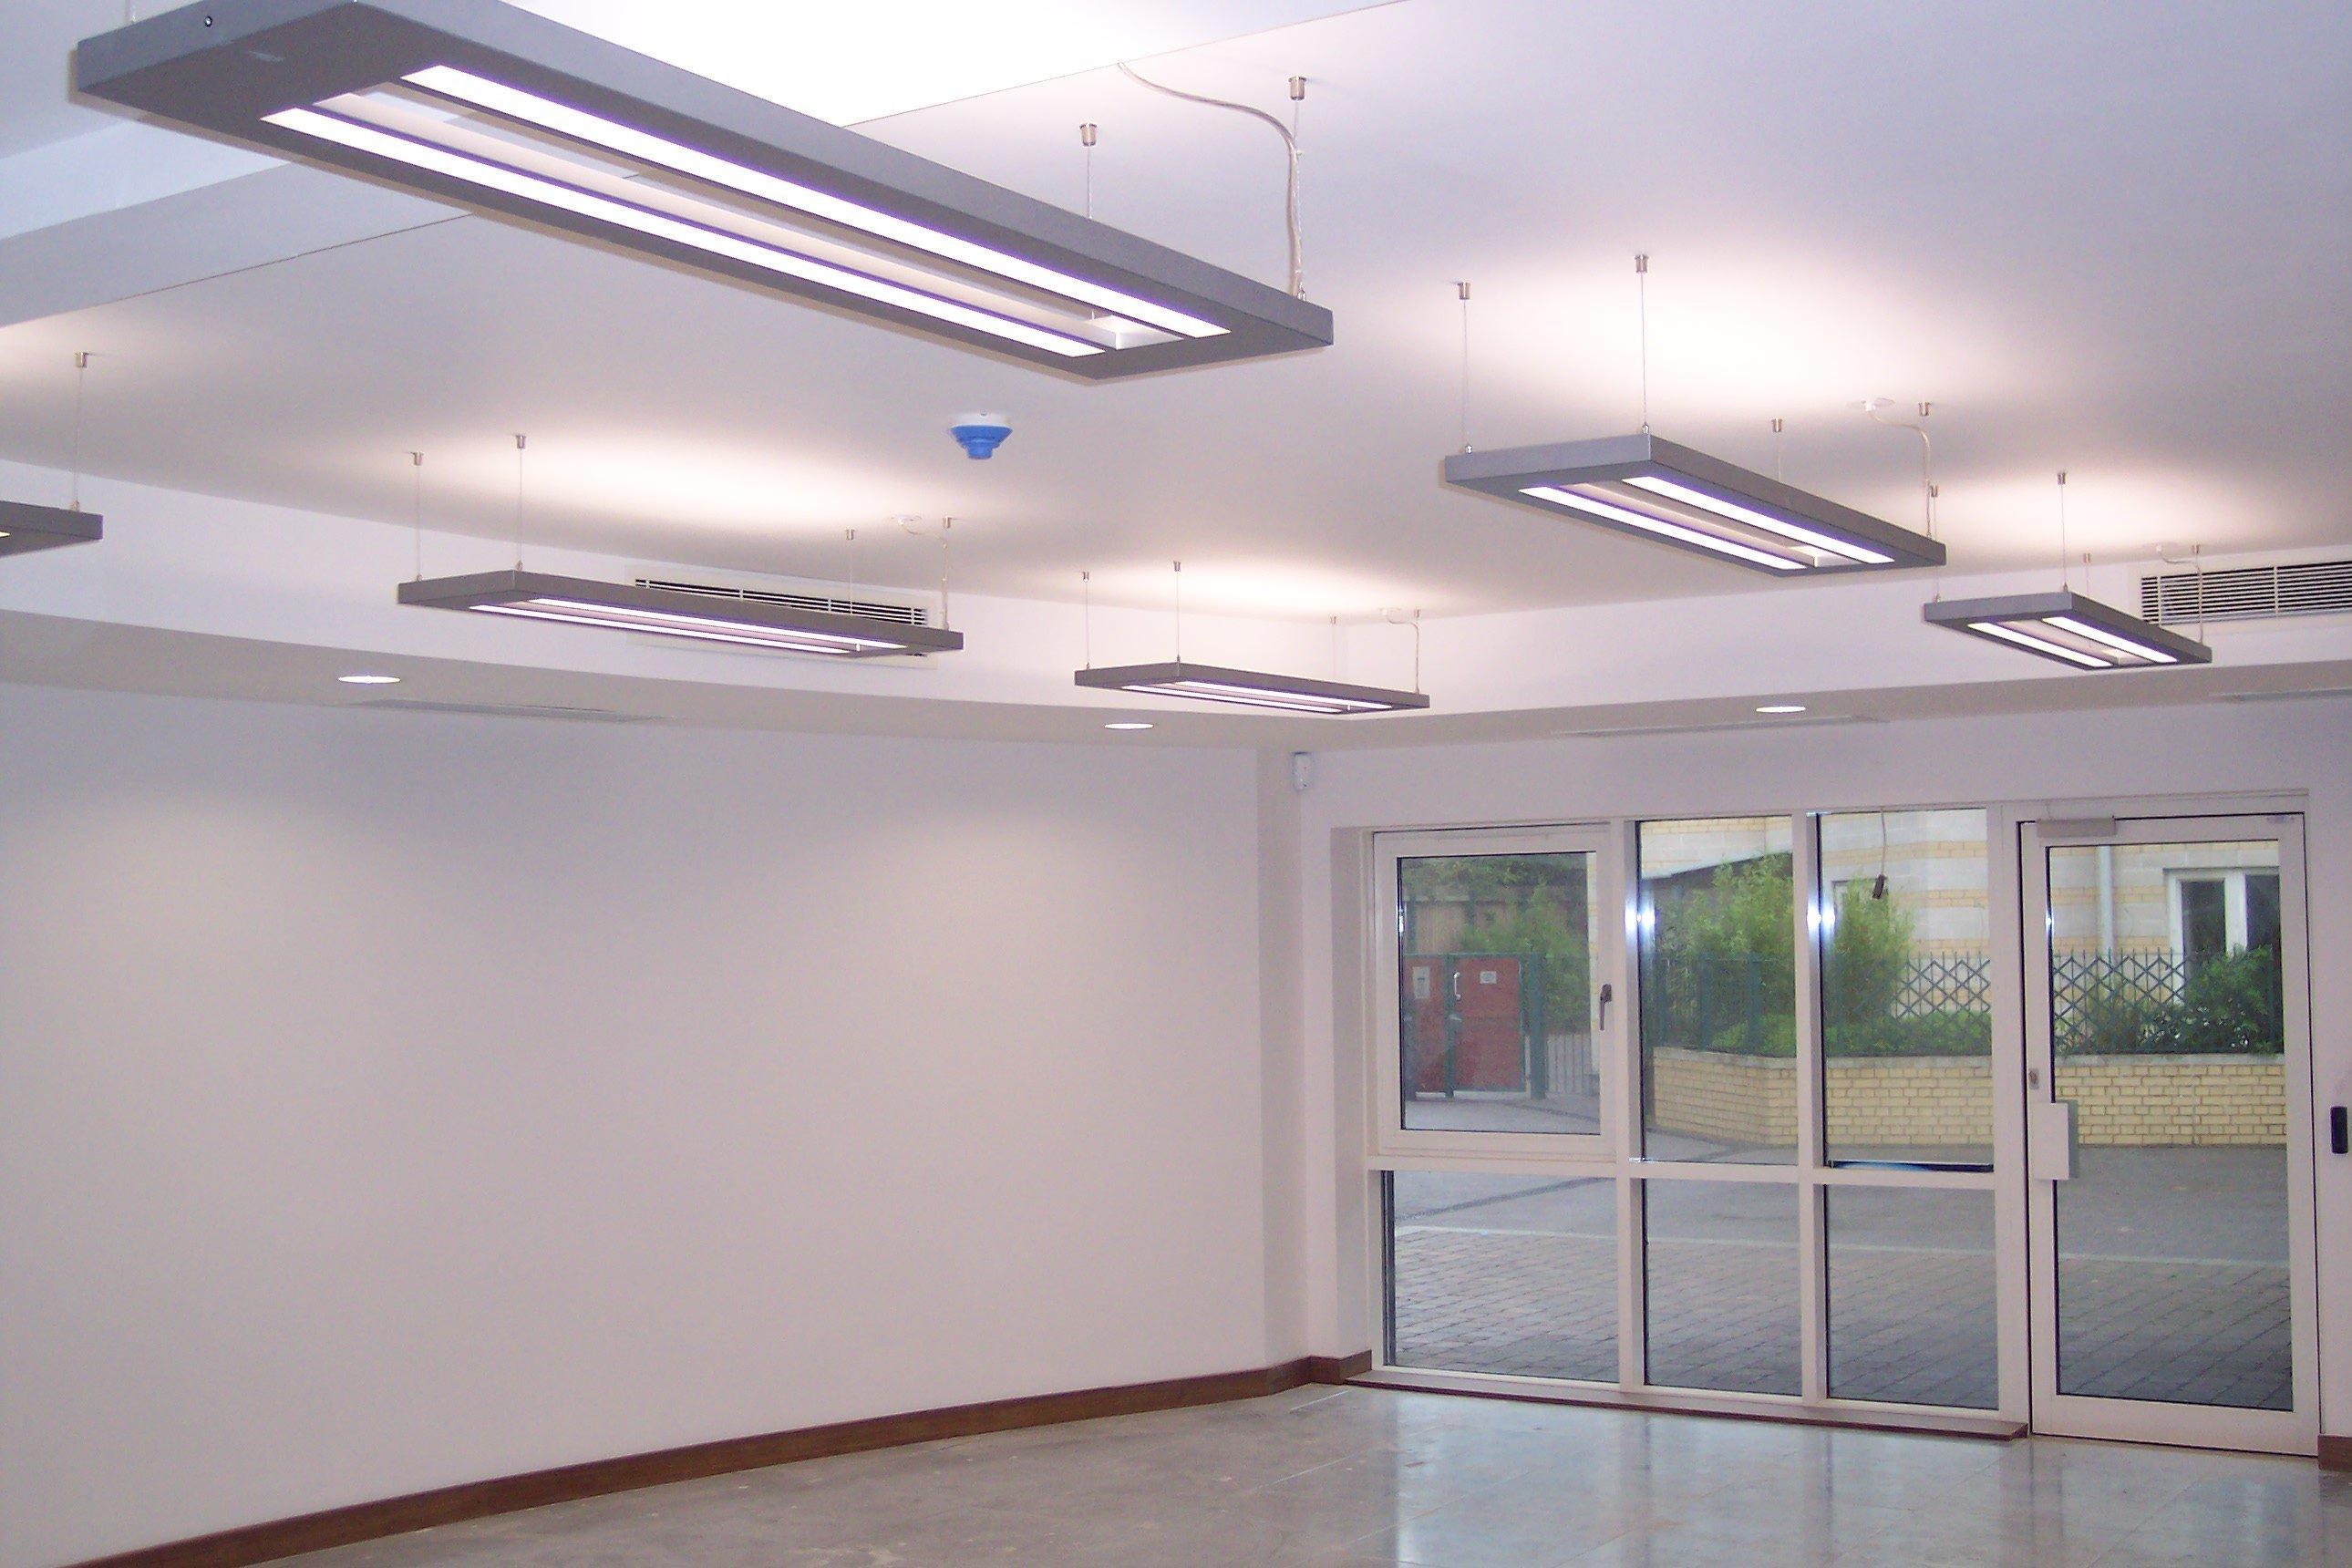 Contemporary lighting tunbridge wells kent co tech lighting